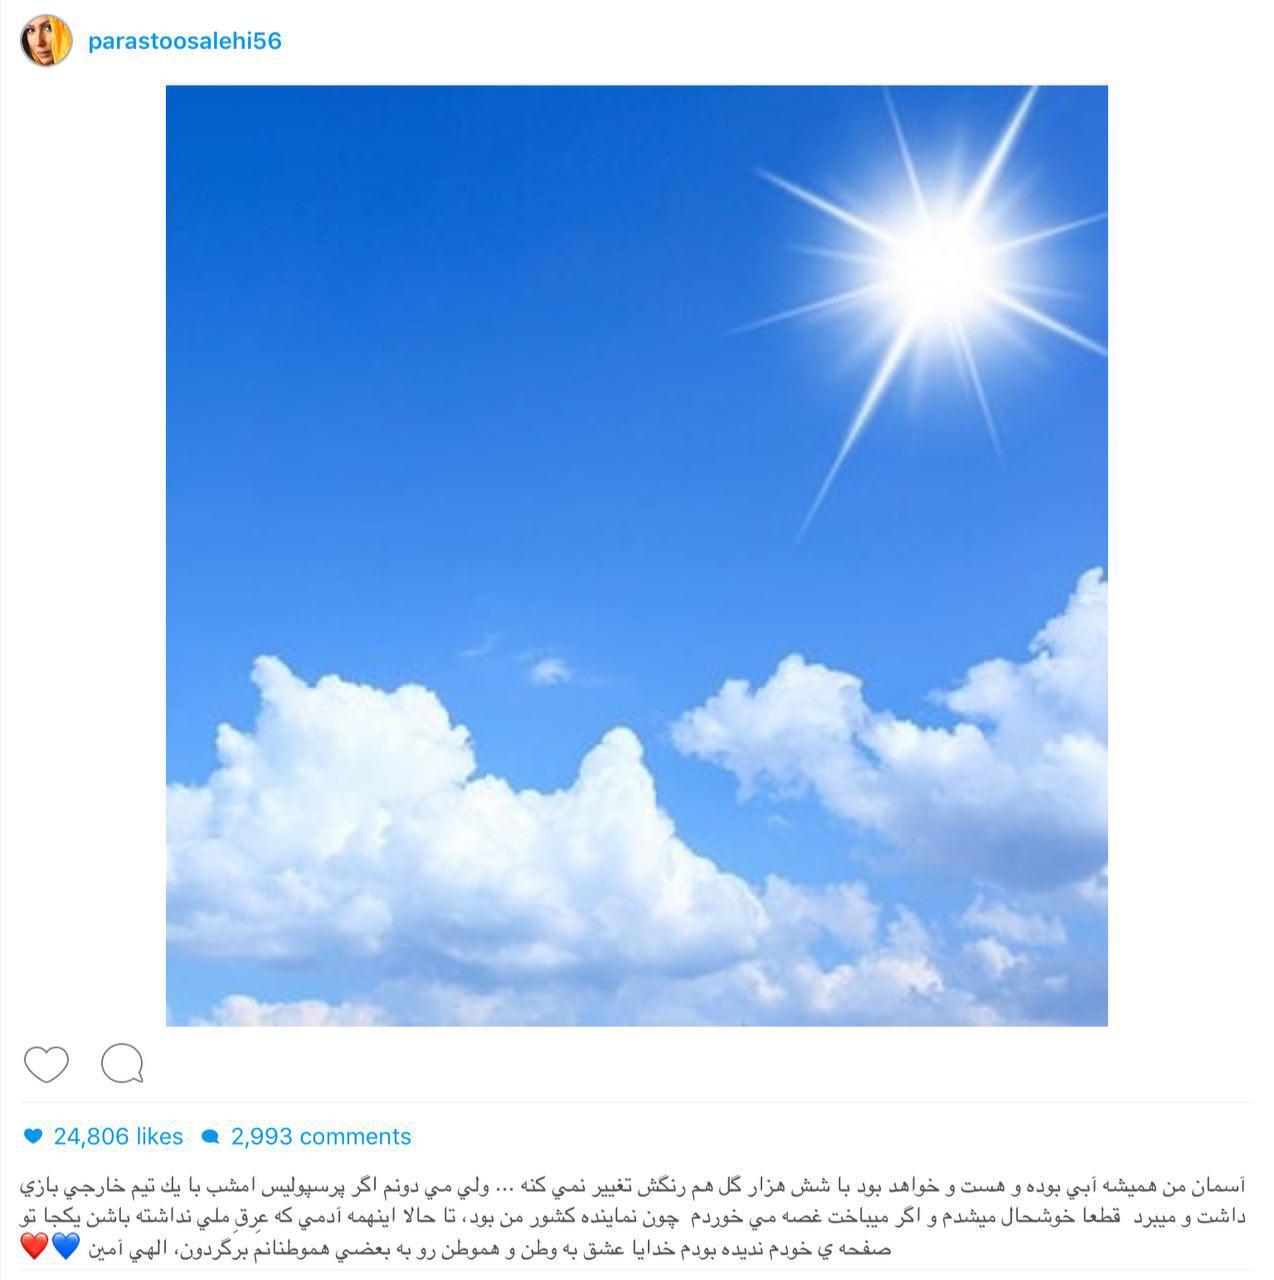 واکنش پرستو صالحی به شکست استقلال مقابل العین